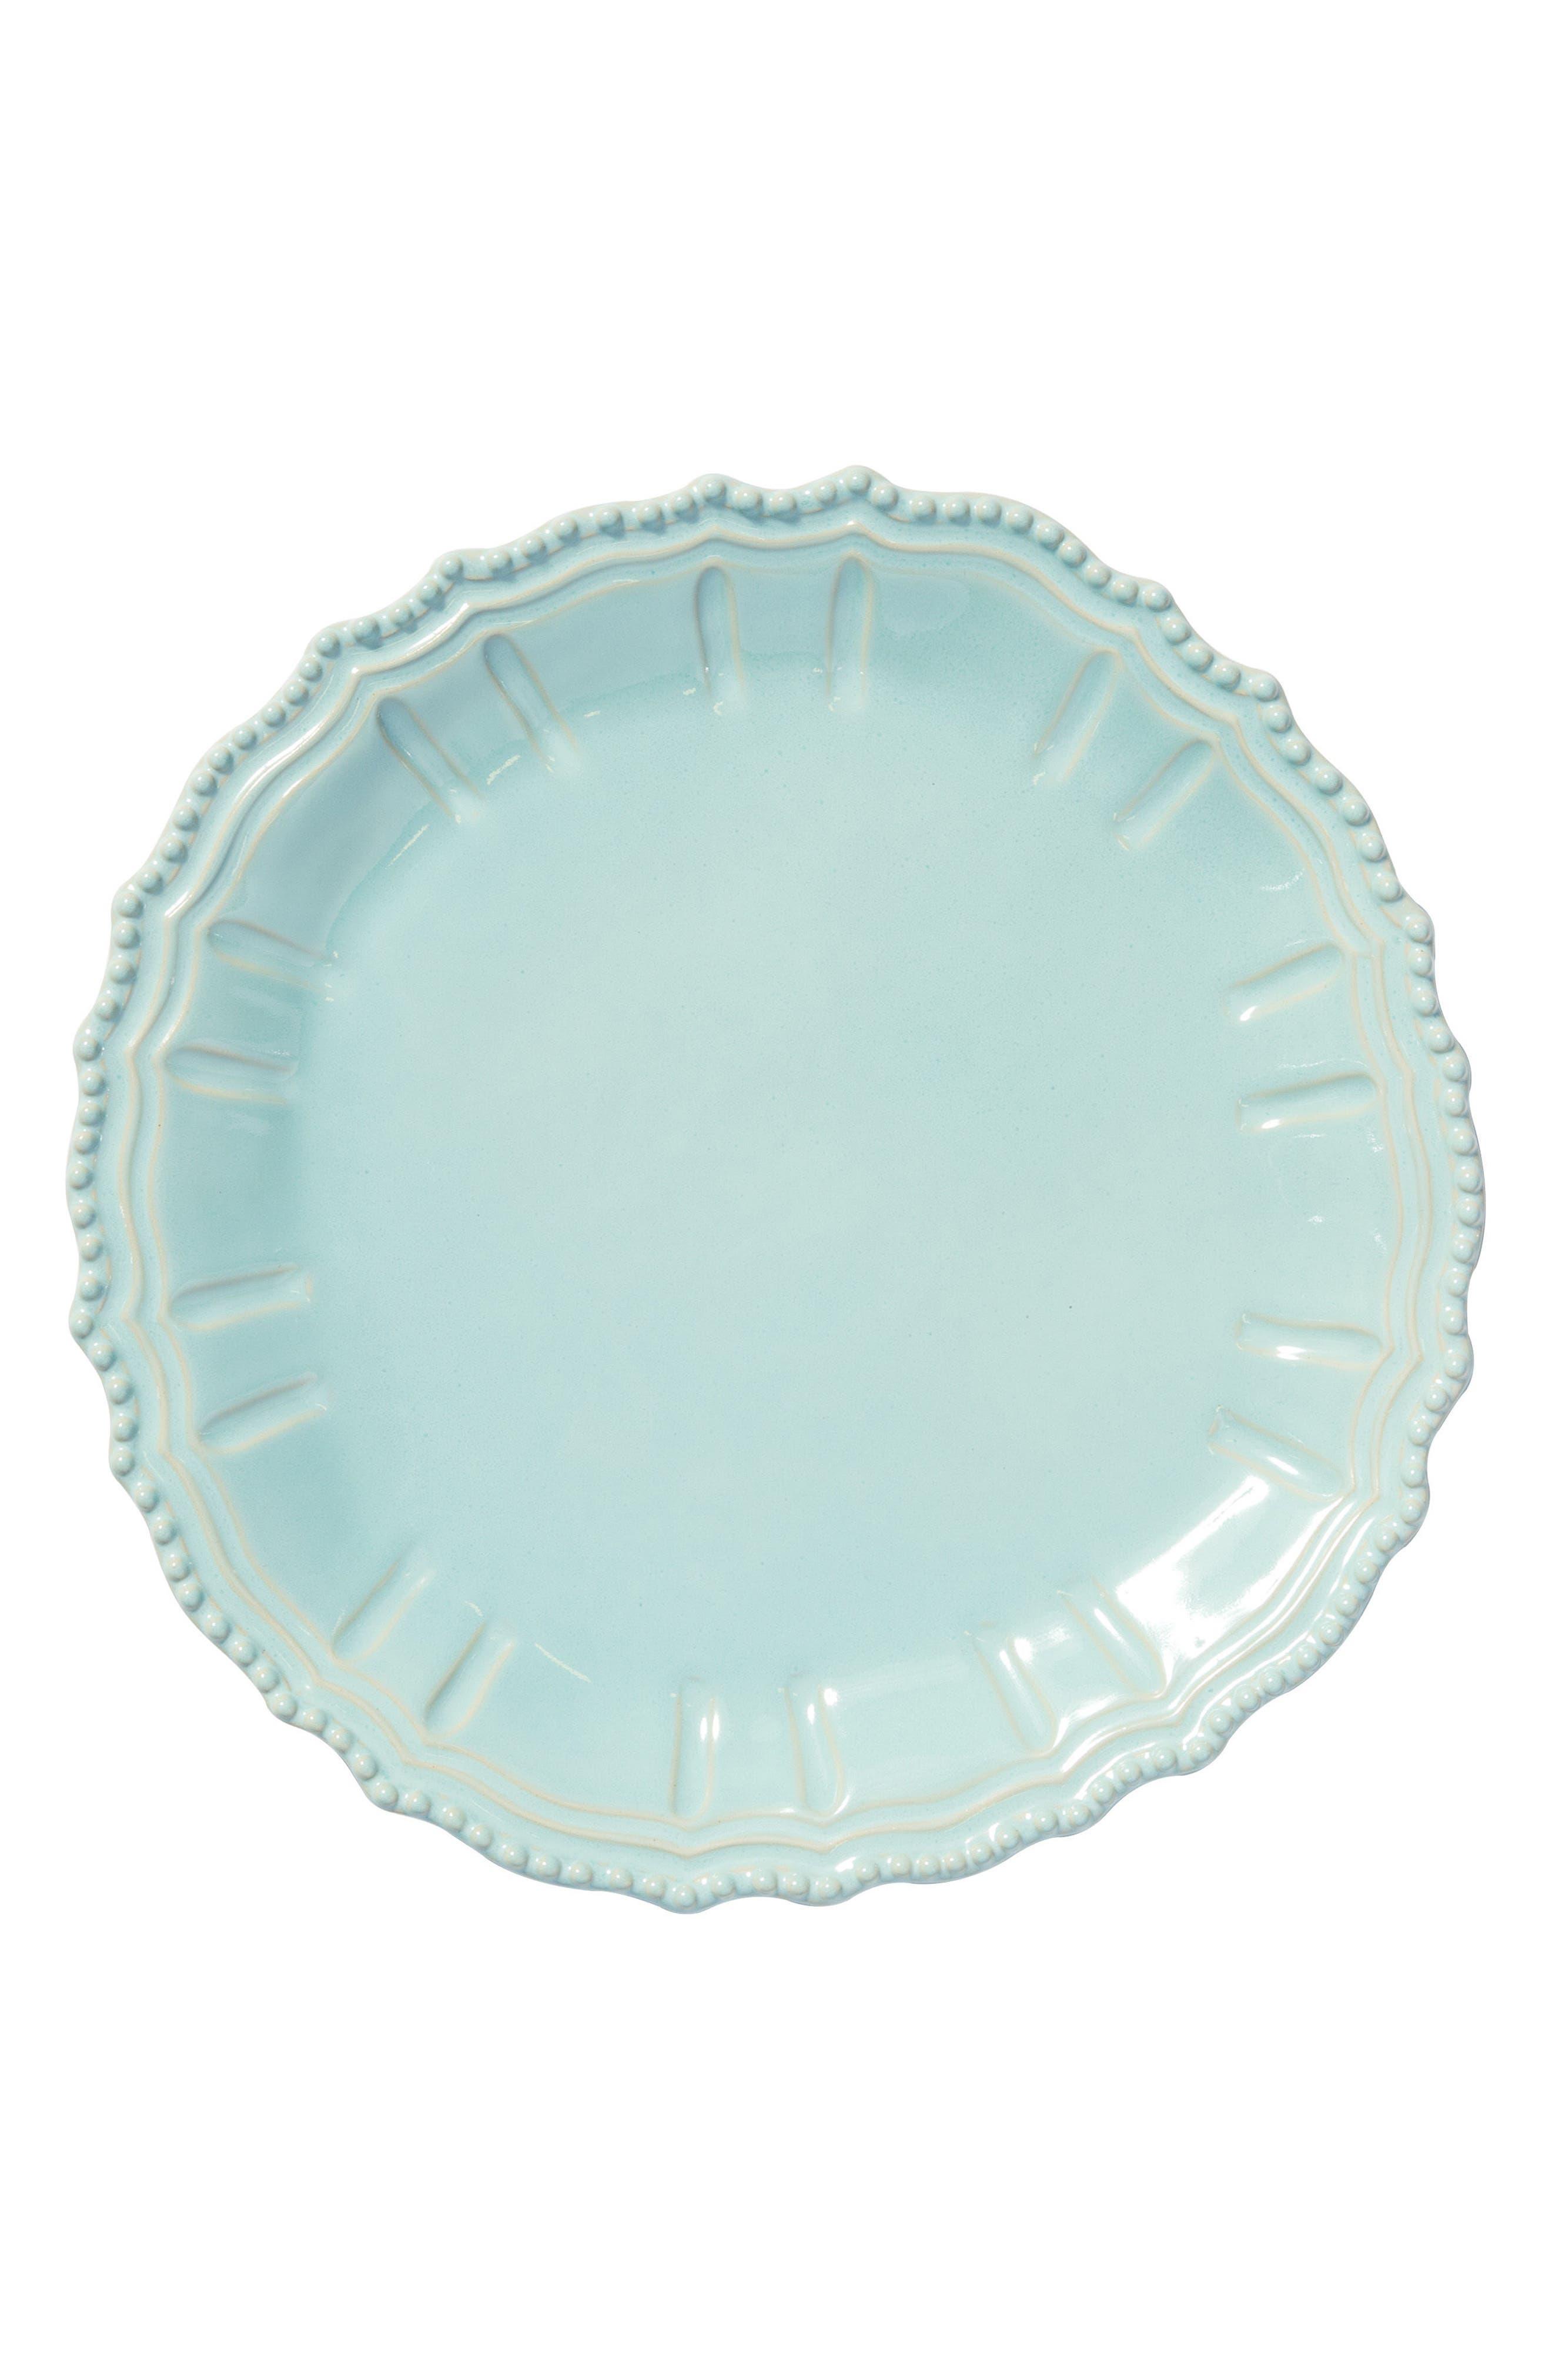 Incanto Stone Baroque Platter,                         Main,                         color, Aqua